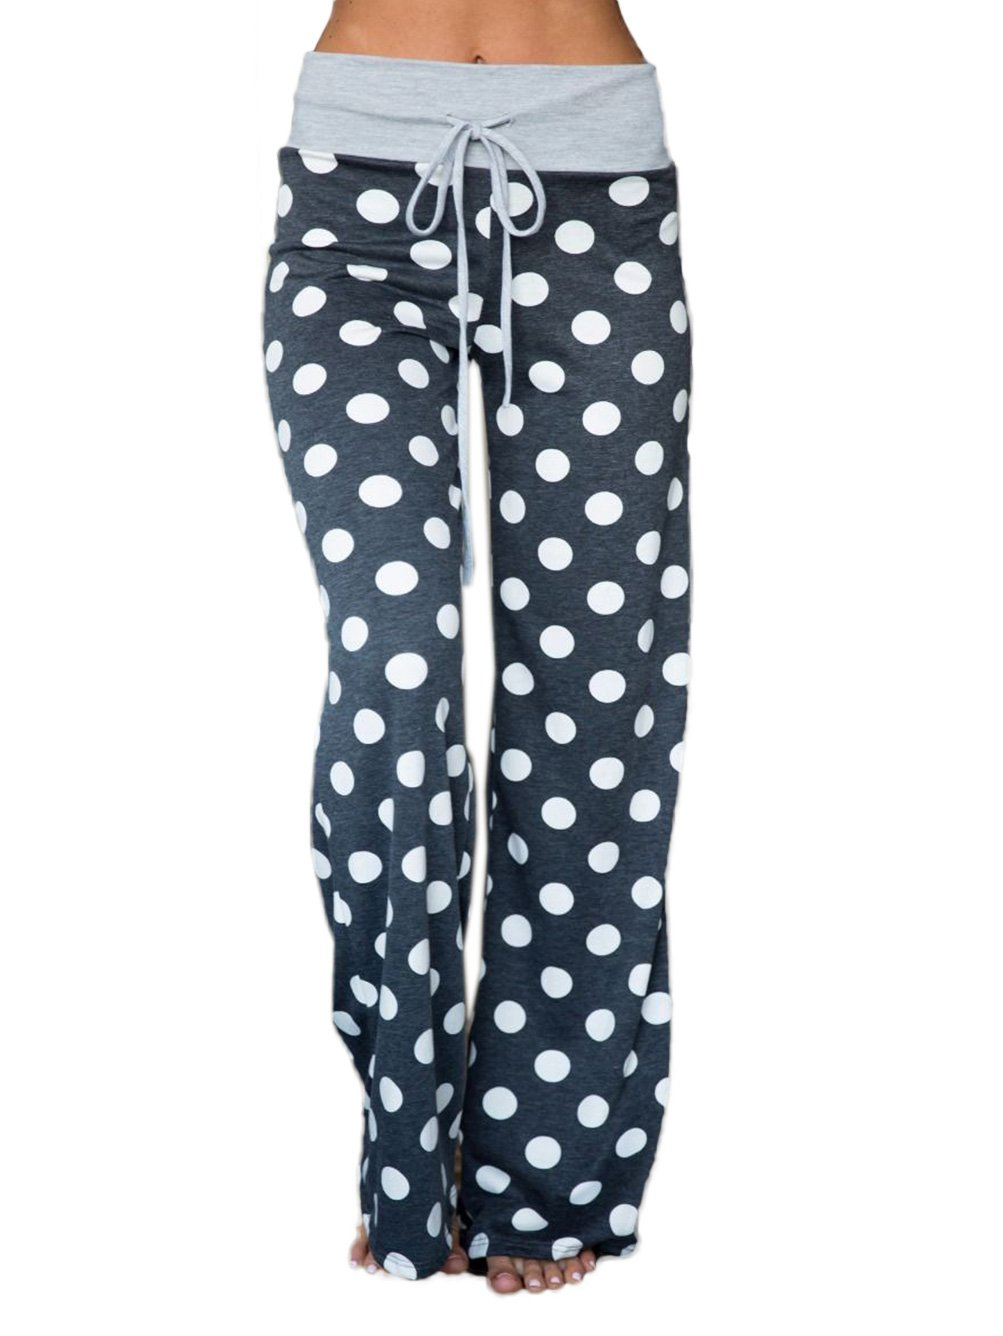 WD-Amour Women's Comfy Stretch Floral Print Drawstring Palazzo Wide Leg Lounge Pants (Medium, Grey2)